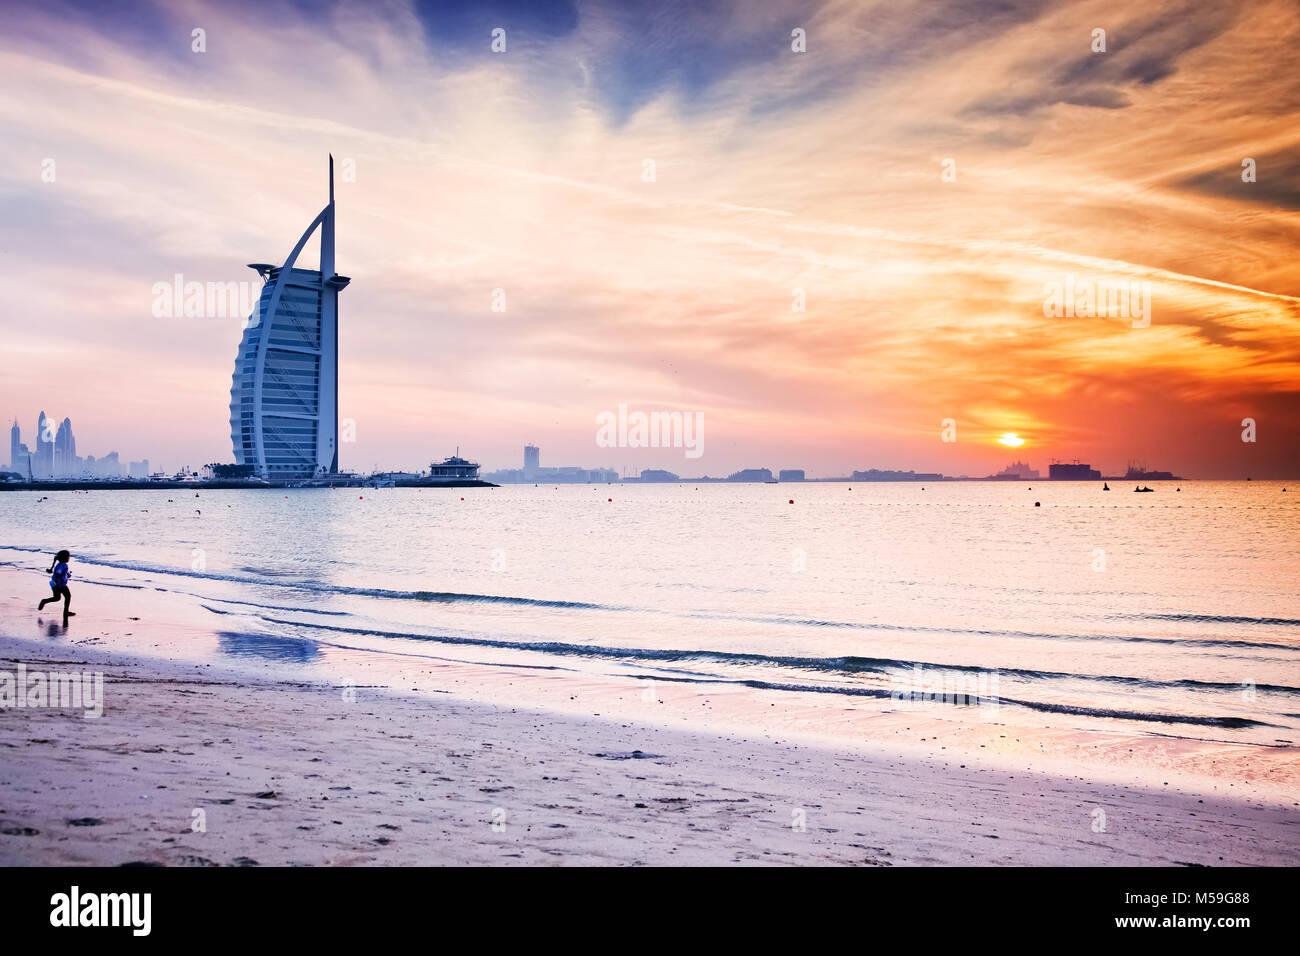 DUBAI, UAE - FEBRUARY 2018 :The world's first seven stars luxury hotel Burj Al Arab at sunset seen from Jumeirah - Stock Image